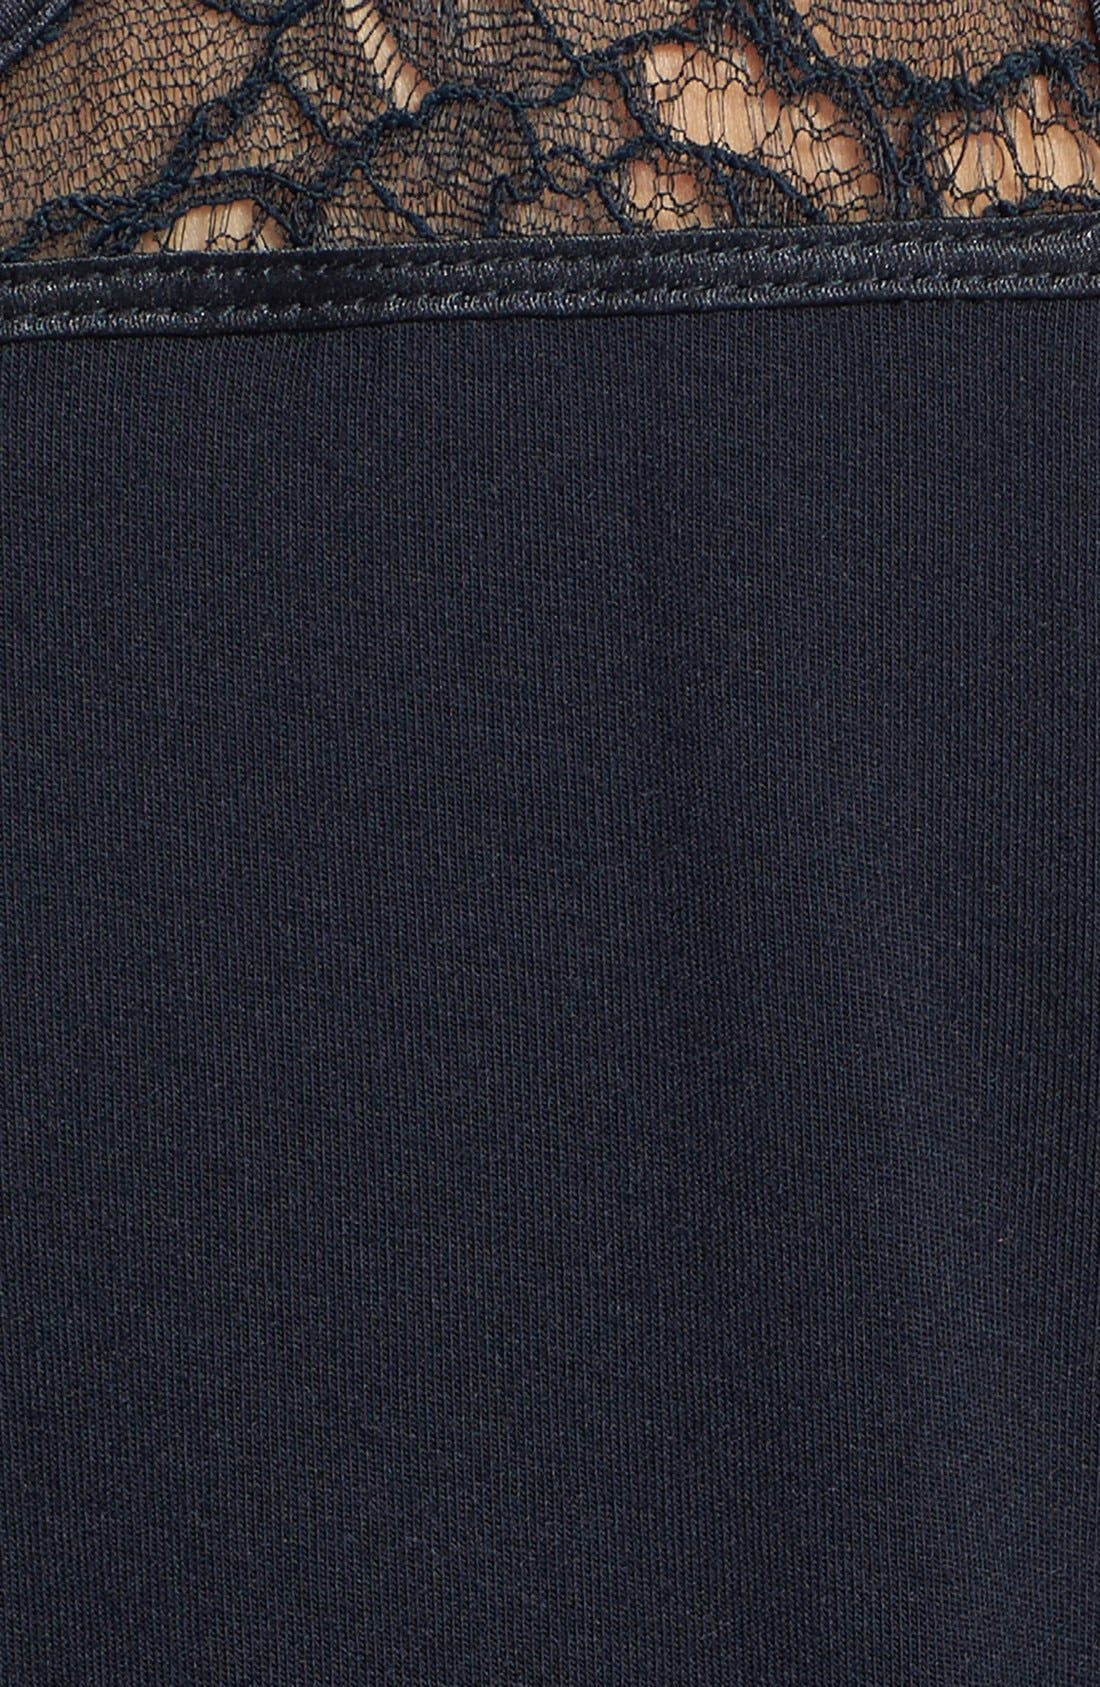 Alternate Image 3  - Midnight by Carole Hochman 'Always On My Mind' Pajamas (Plus Size)